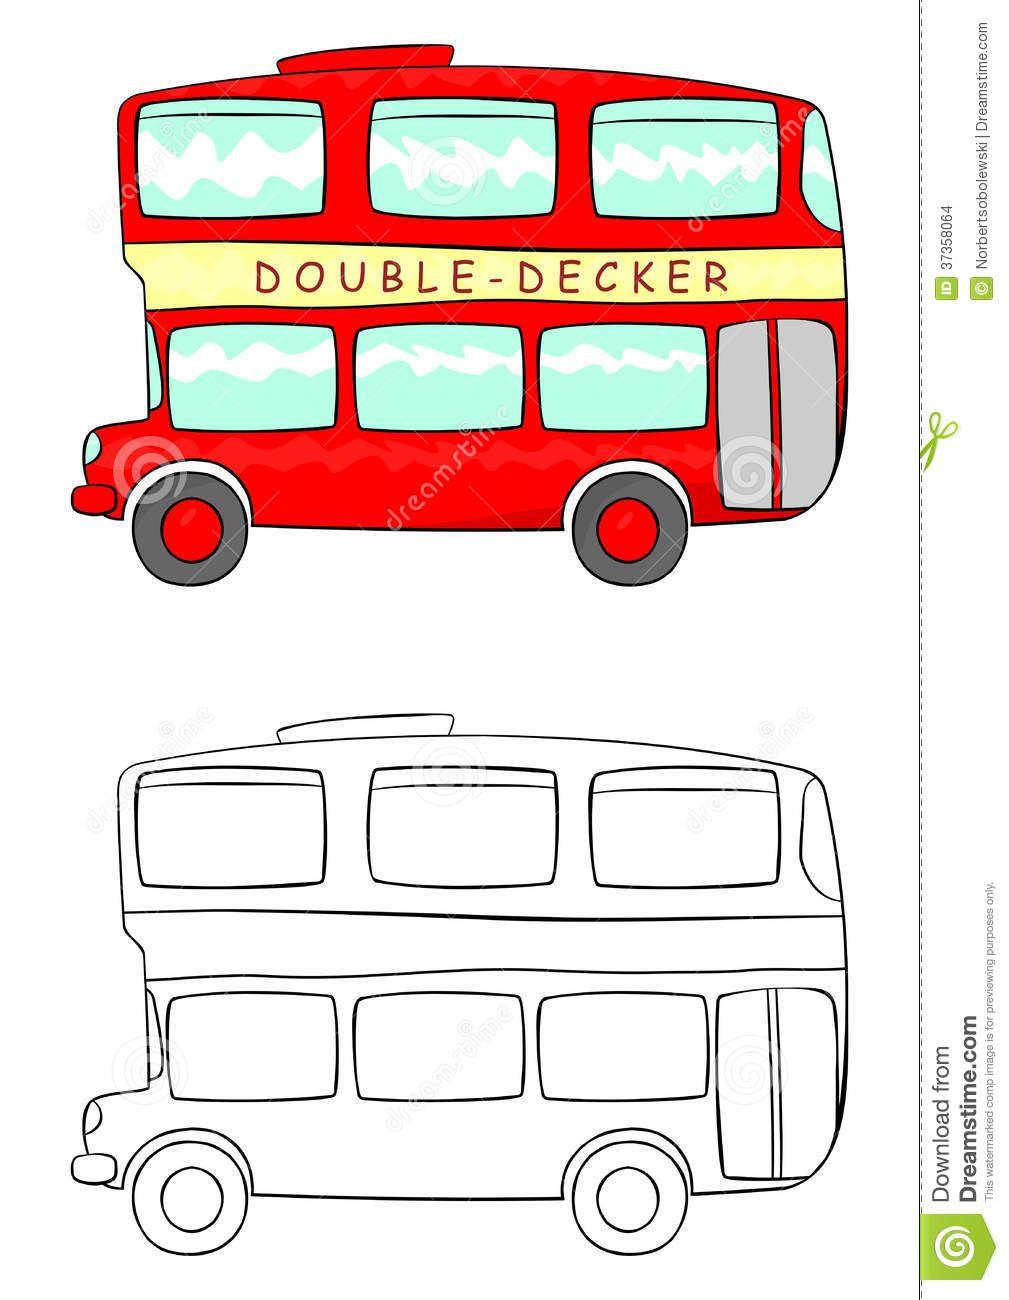 dibujo colorear autobus london - Buscar con Google | APLICACIONES ...